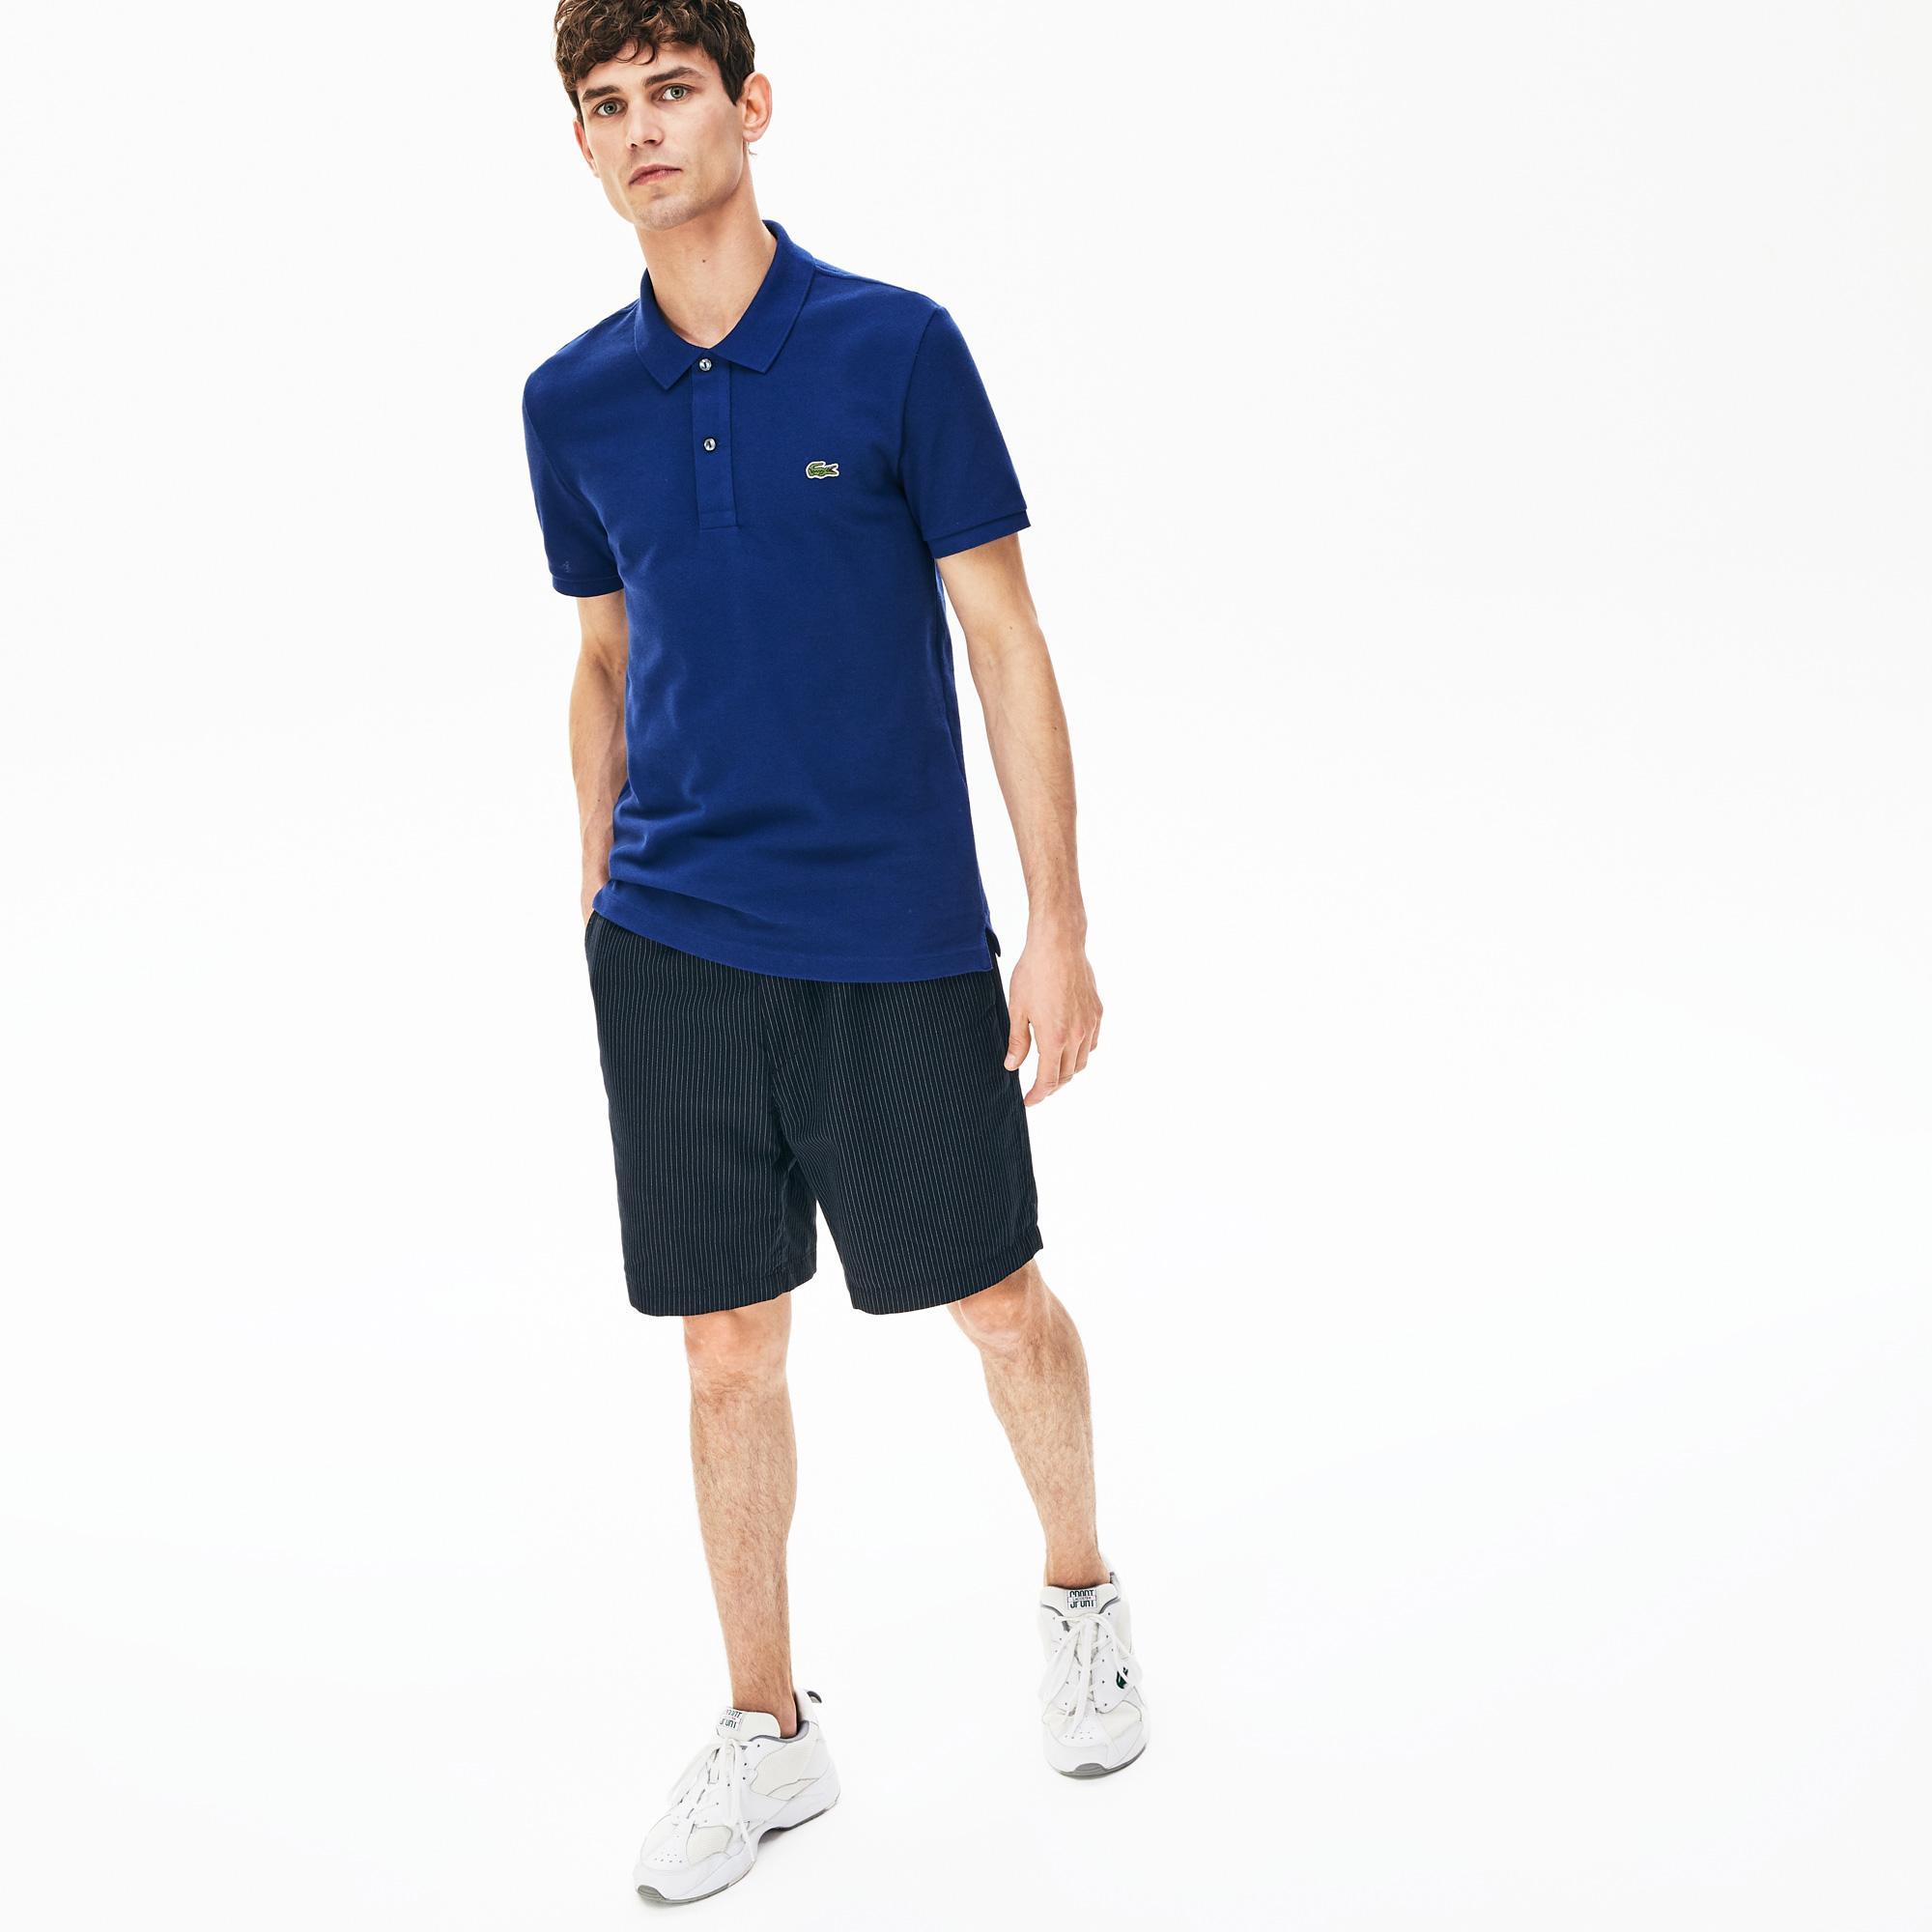 Lacoste Erkek Slim Fit Saks Mavi Polo